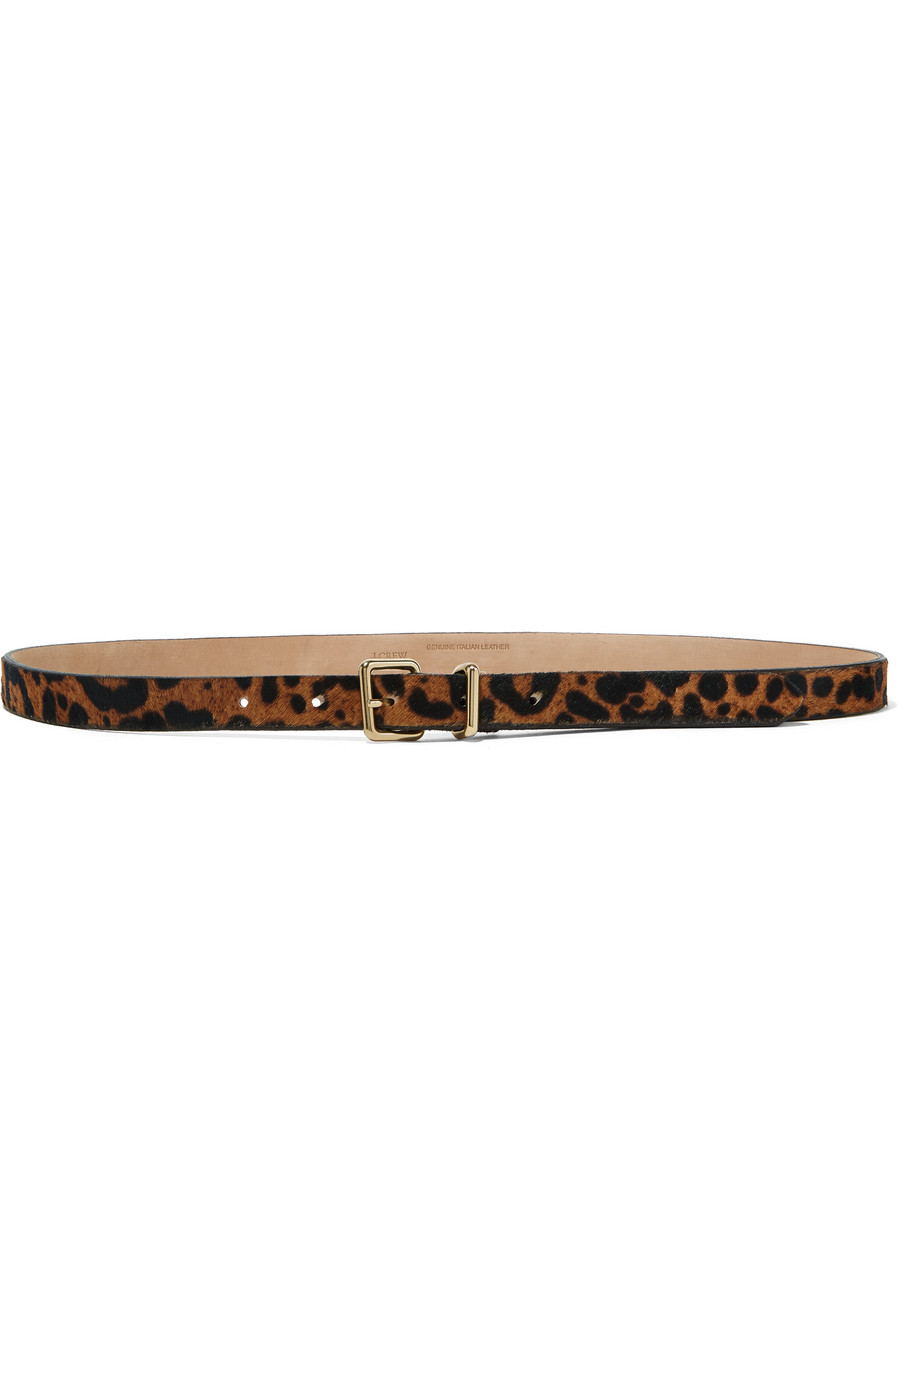 J.Crew Leopard-Print Calf Hair Belt, Leopard Print, Women's, Size: XS